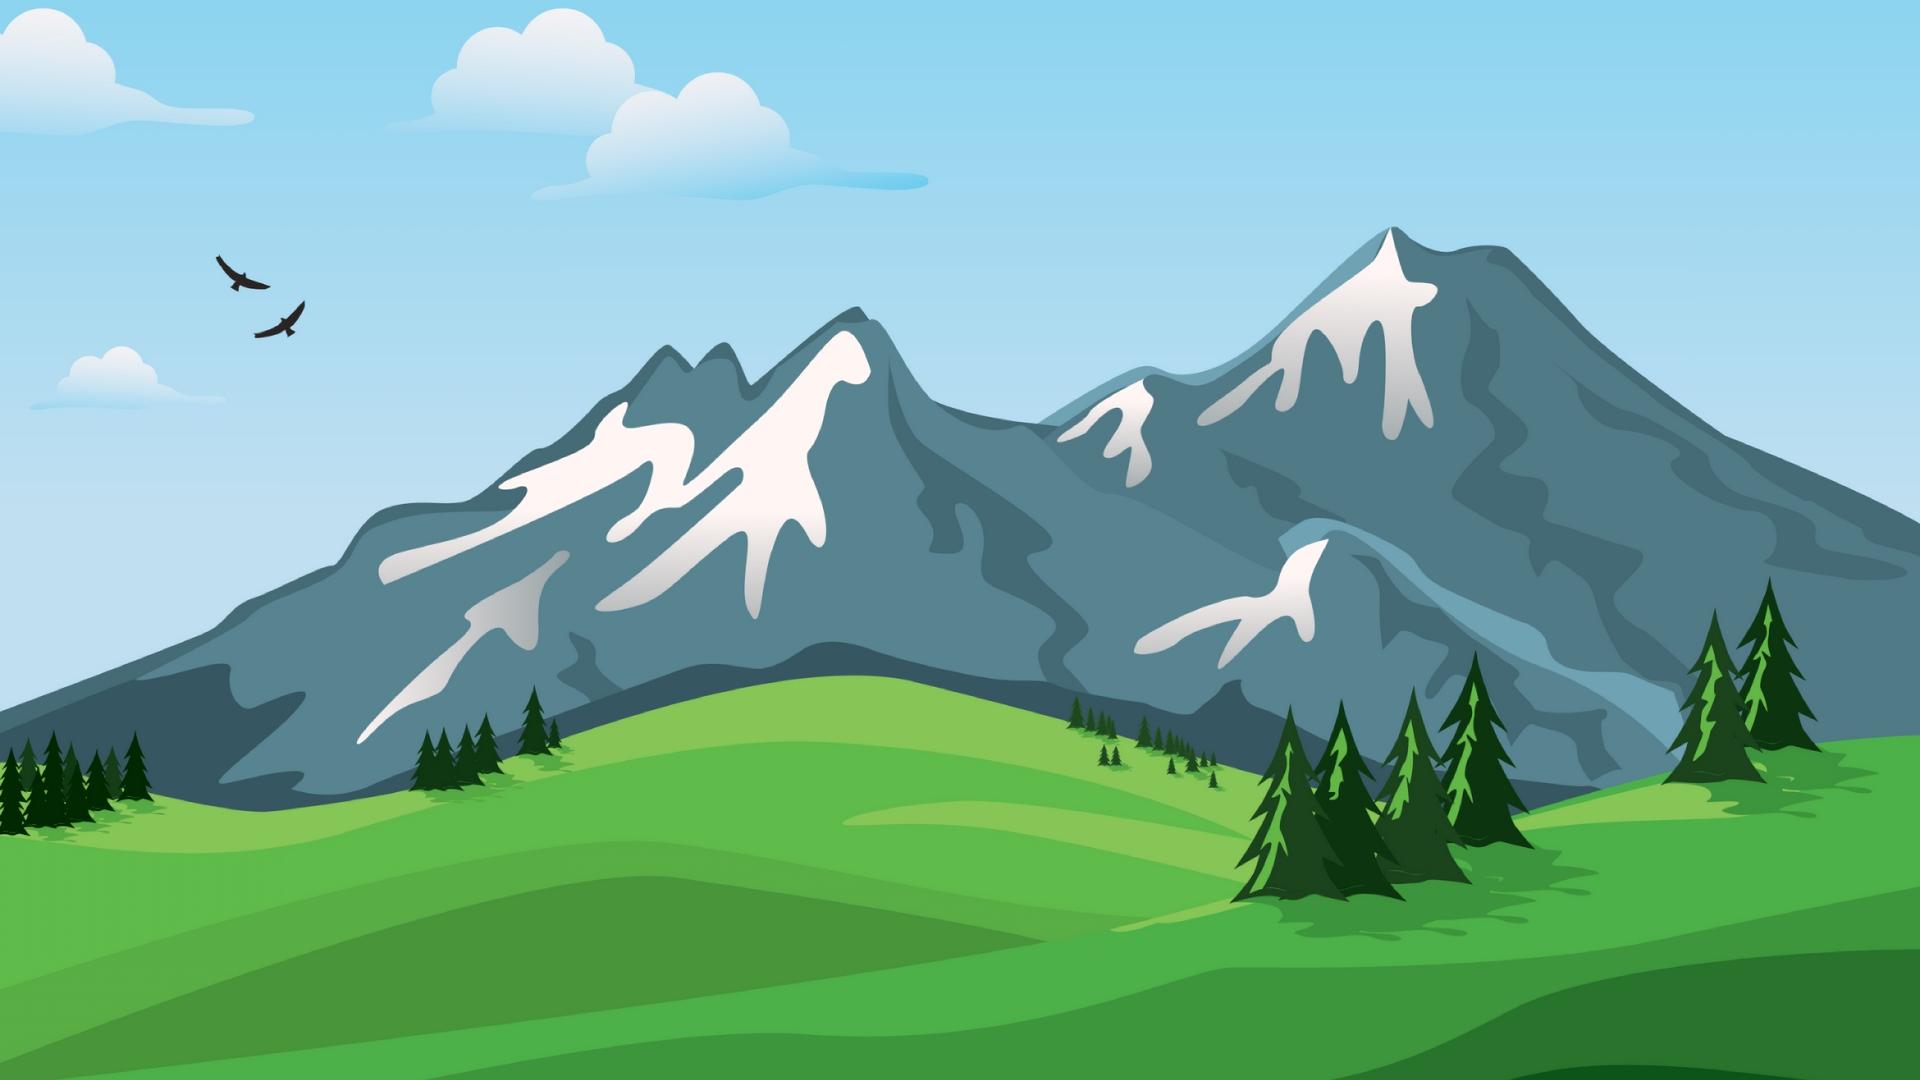 Wallpaper Mountains, Vector, Landscape, Nature - Mountain Vector Wallpaper Hd - HD Wallpaper